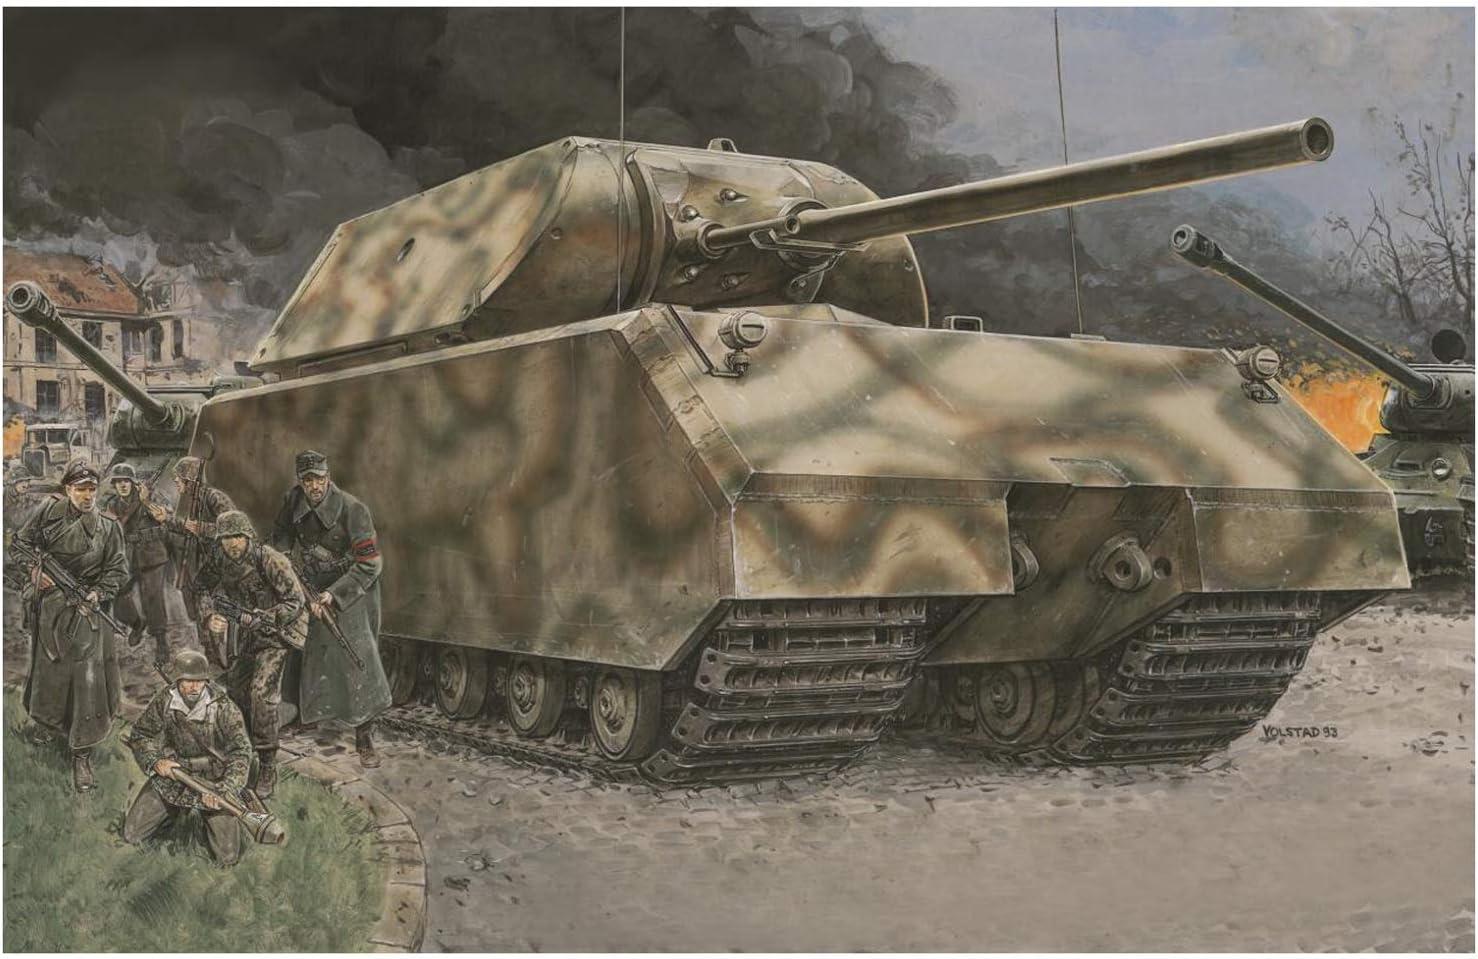 '39-'45 Series 1/35 Maus German Wwii Super-heavy Tank Model Kit